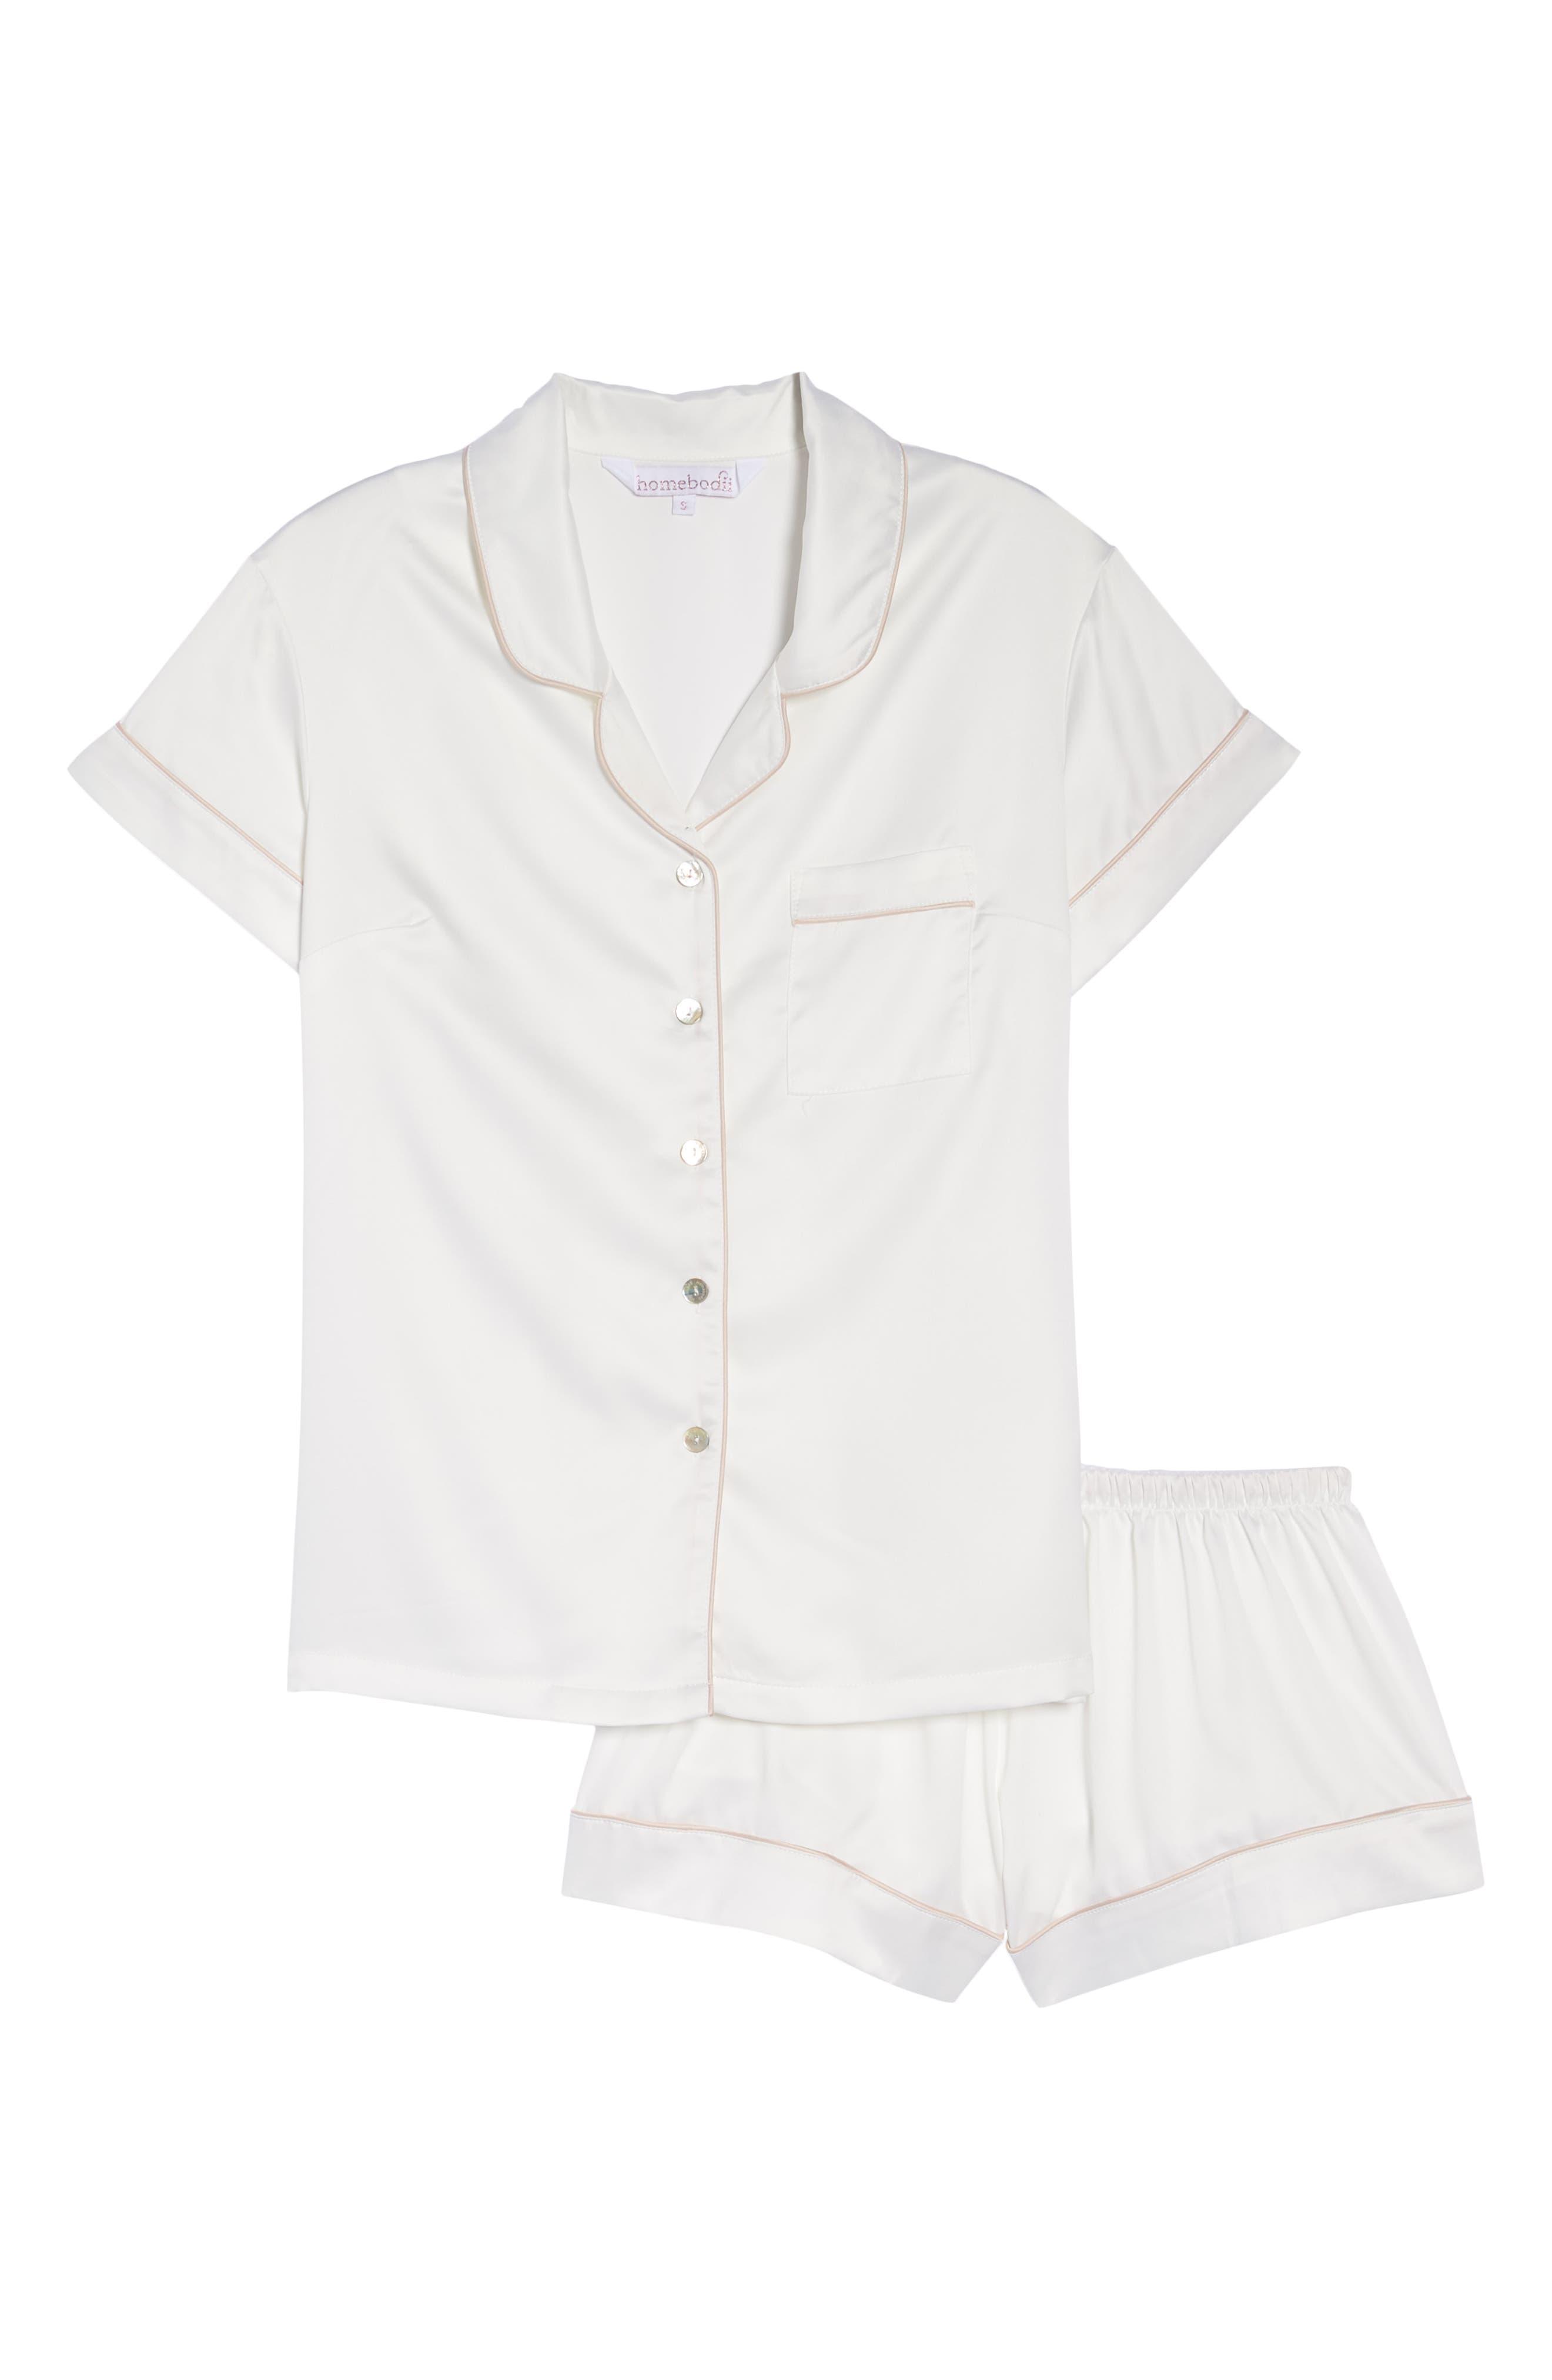 Piped Short Pajamas,                             Alternate thumbnail 4, color,                             White